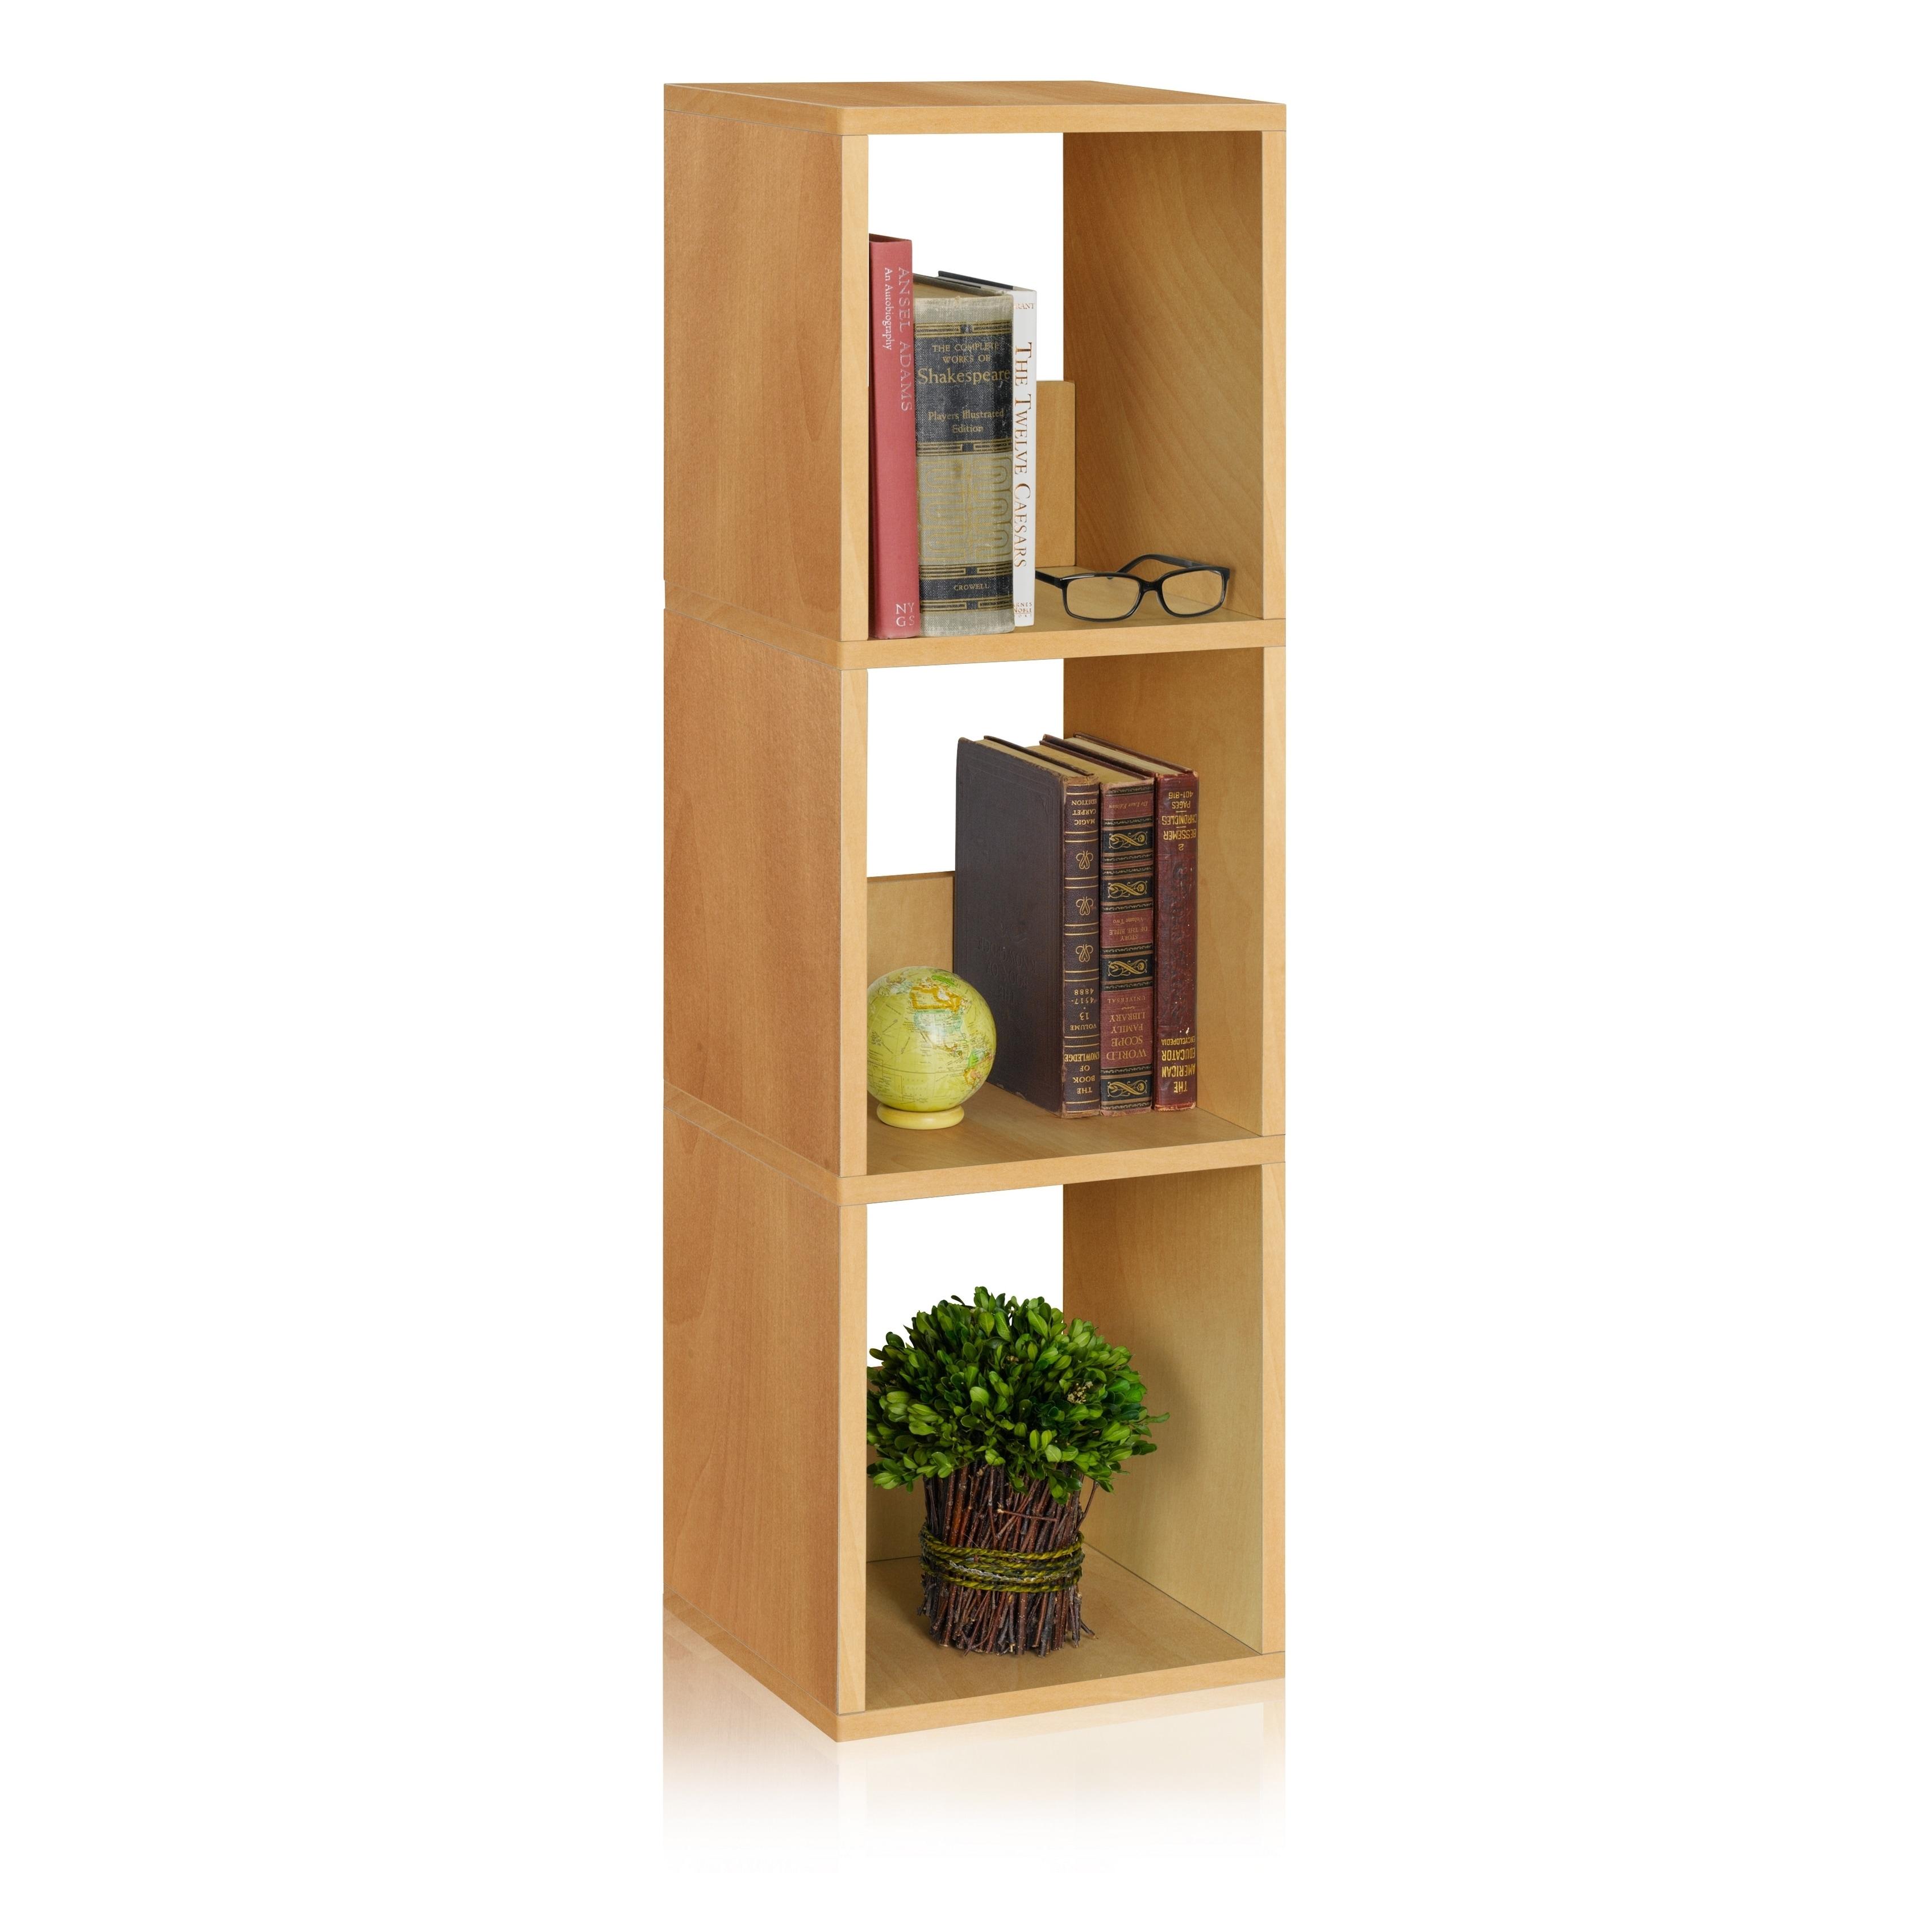 Camden Eco 3-Shelf Narrow Bookcase Storage Shelf by Way Basics LIFETIME  GUARANTEE - Free Shipping Today - Overstock.com - 16545362